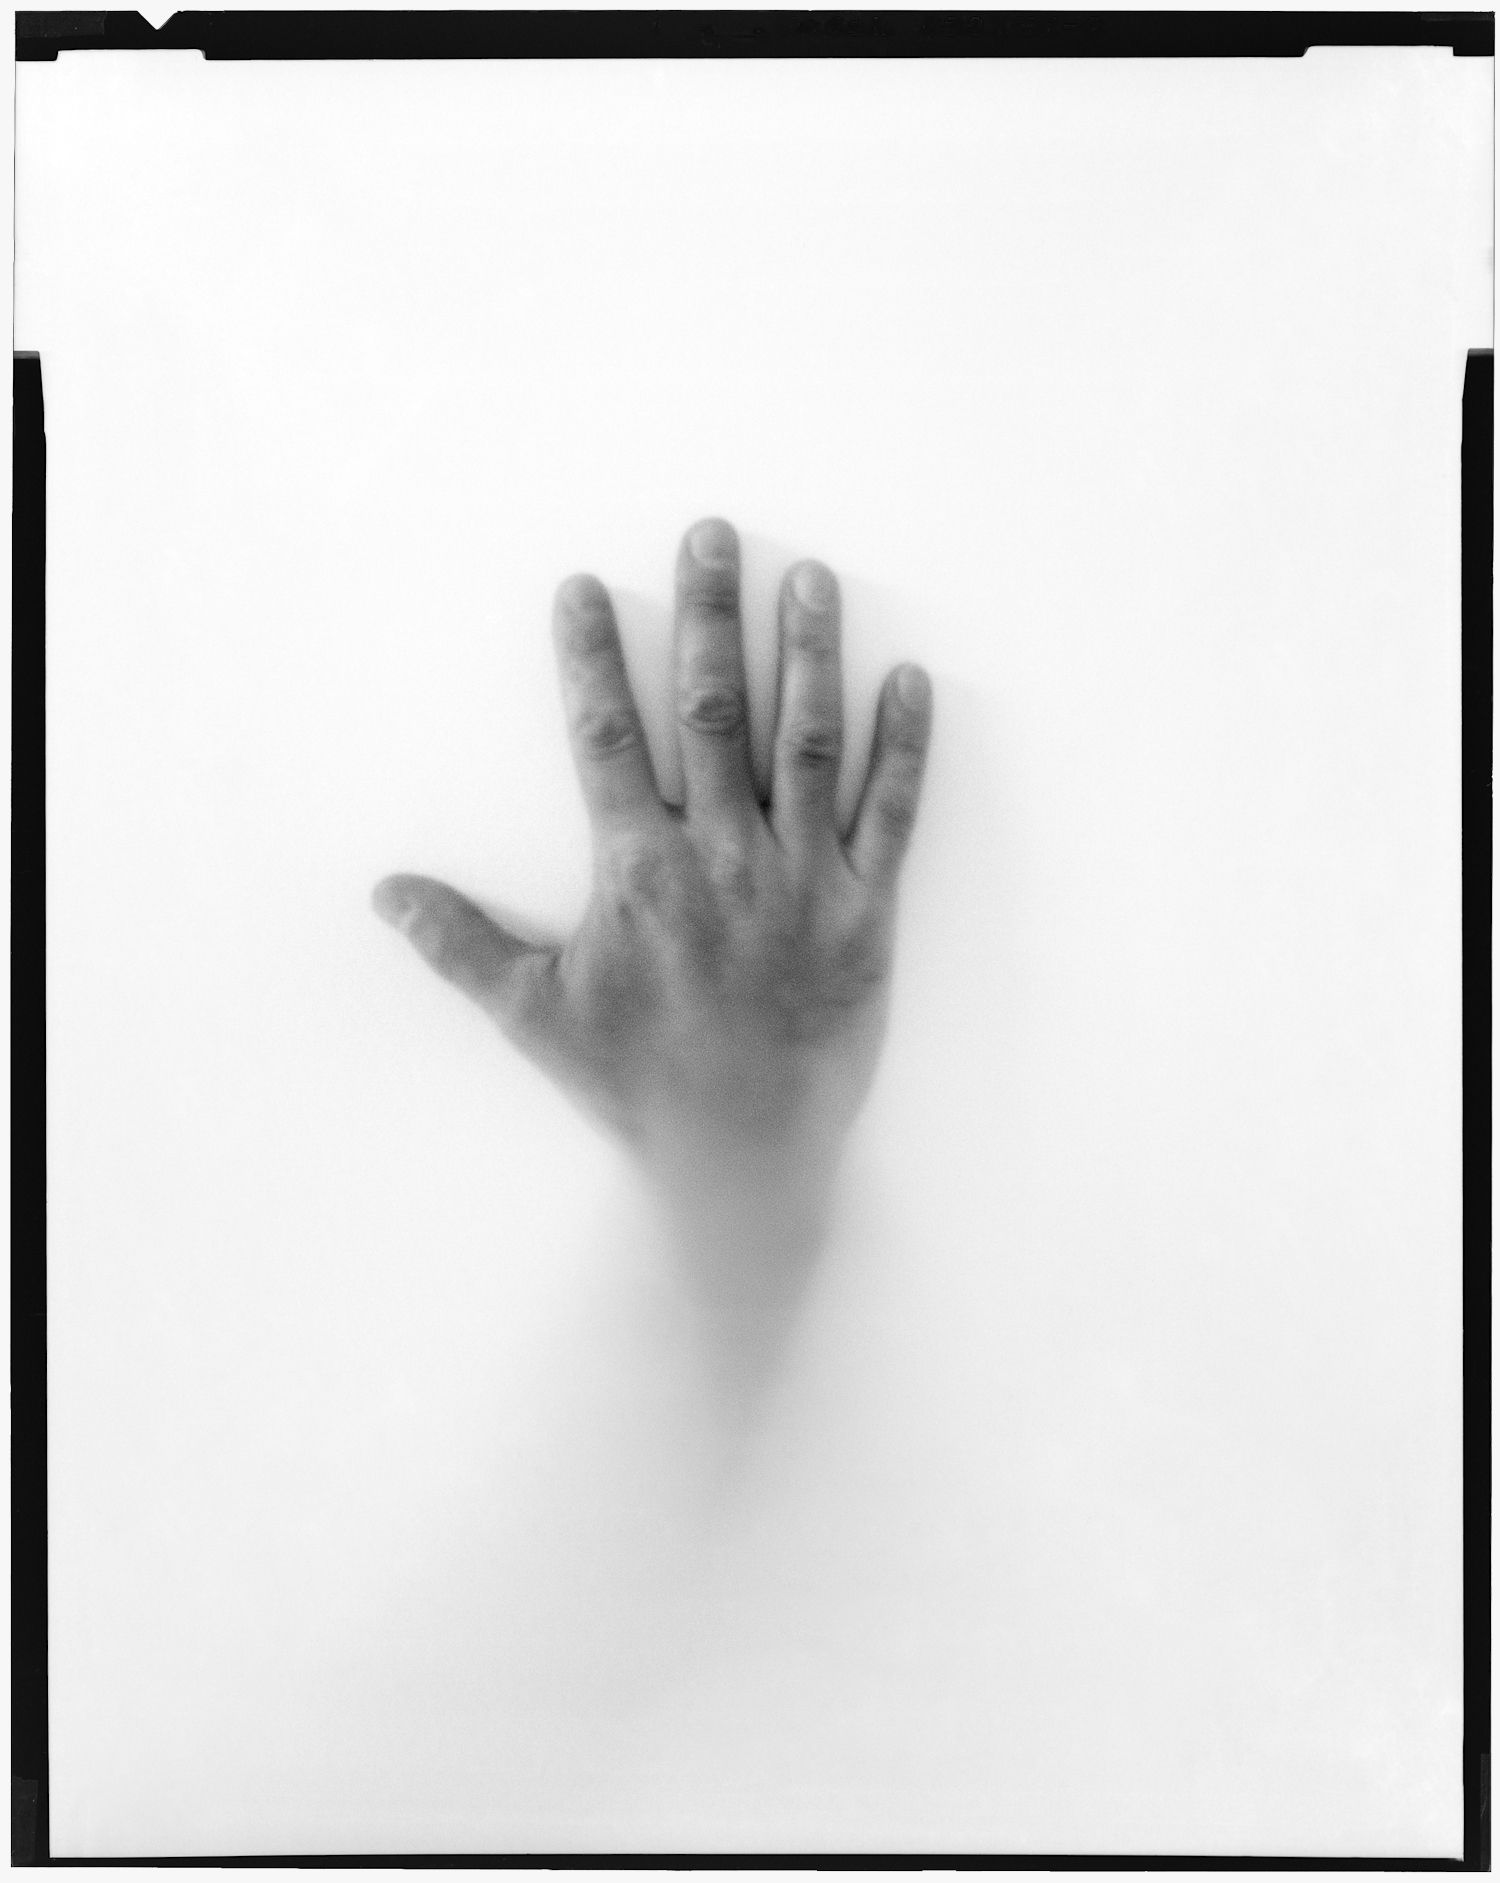 hand zeichen / выдержка00:02:00 / © 2013 svemart